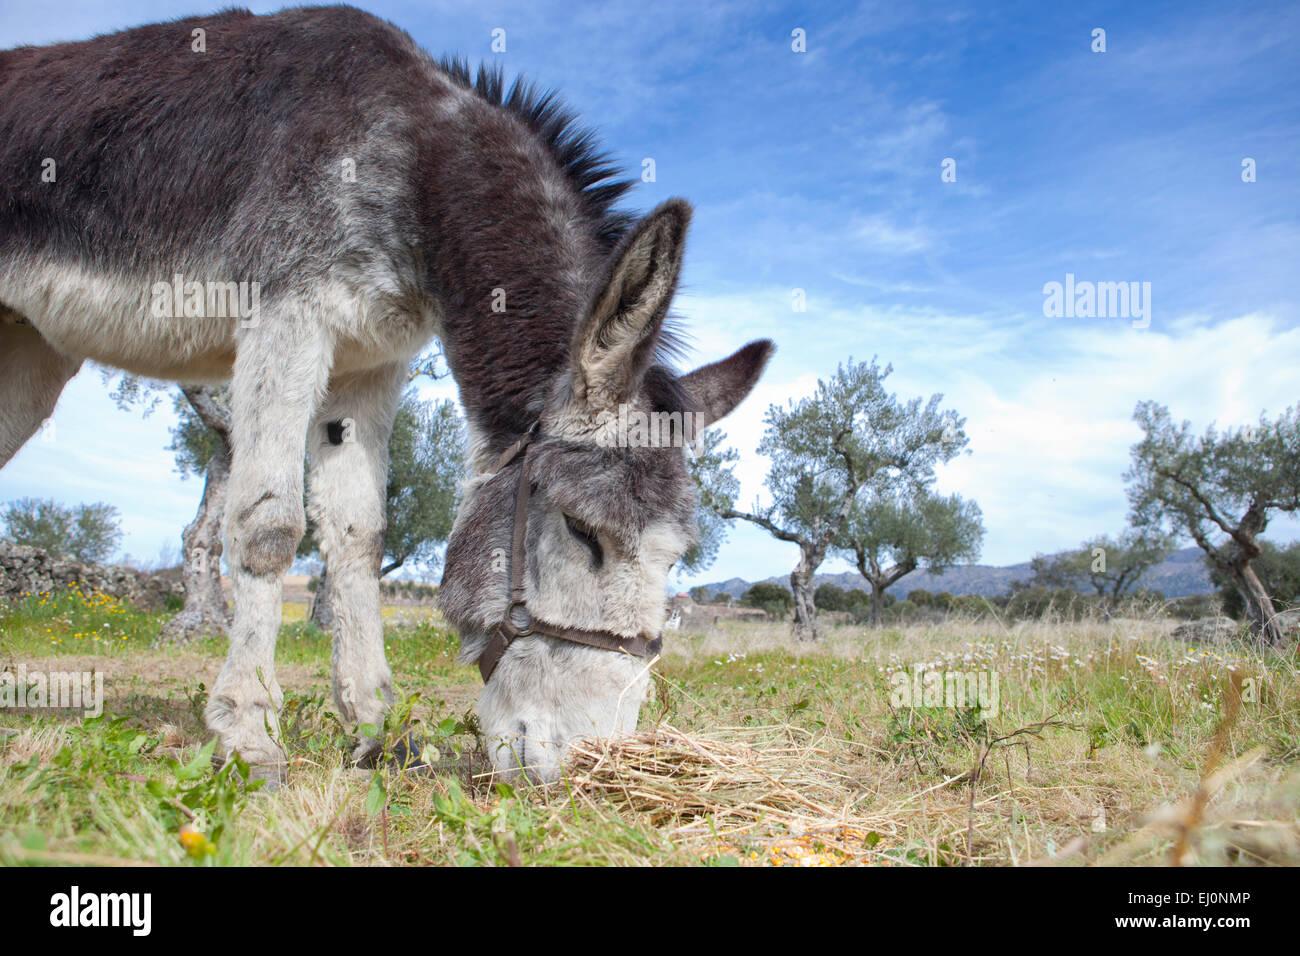 Funny small spanish grey donkey grazing on the grass Stock Photo